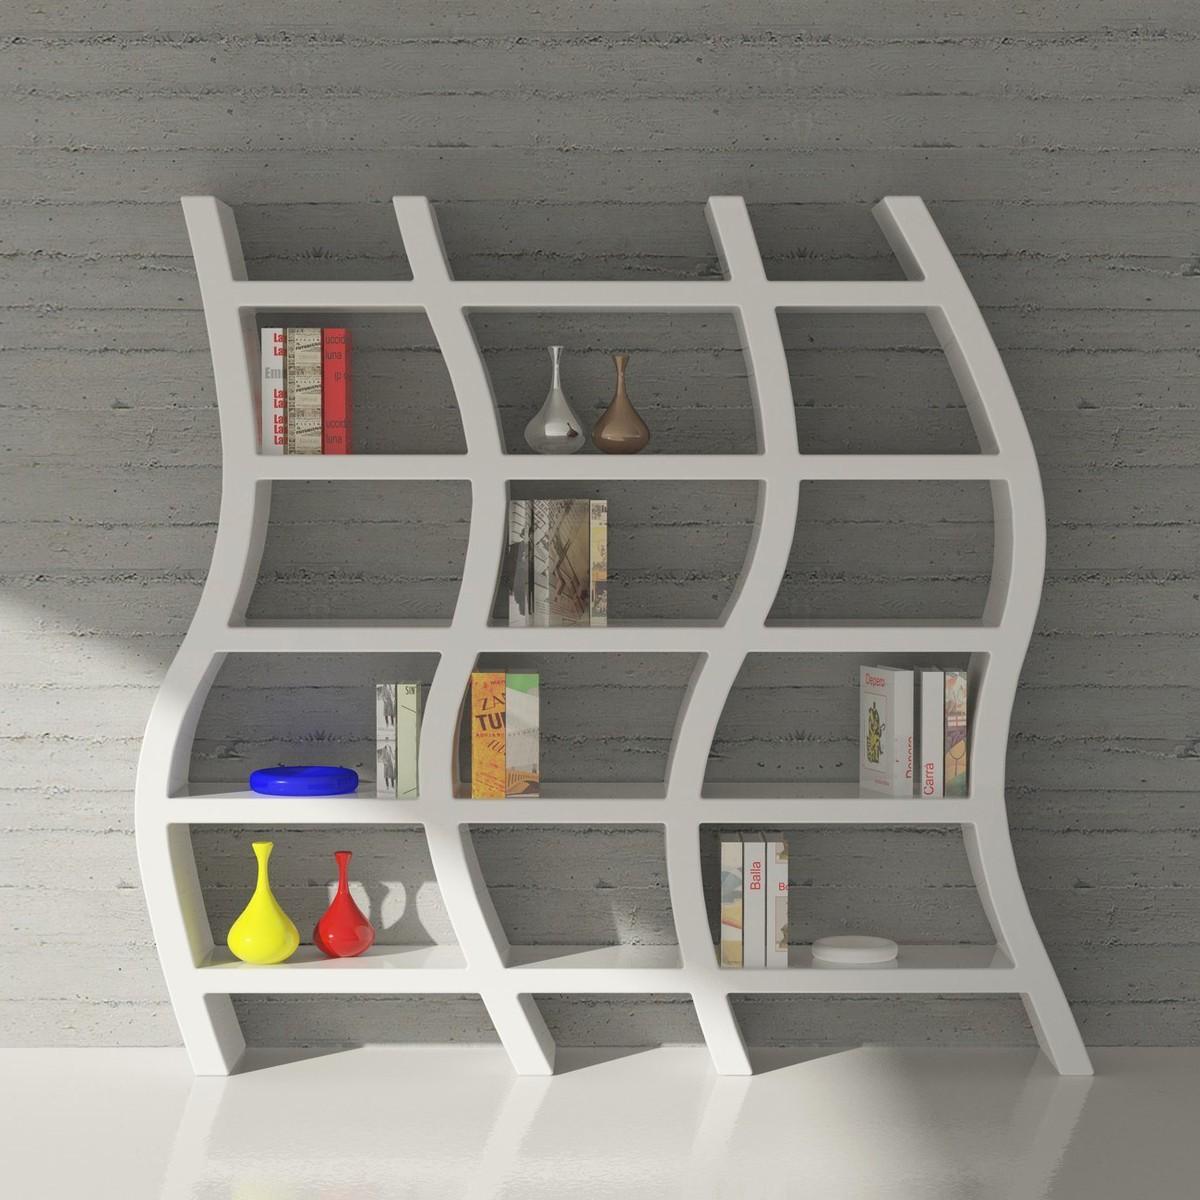 Libreria scaffale da terra bianco Zaum